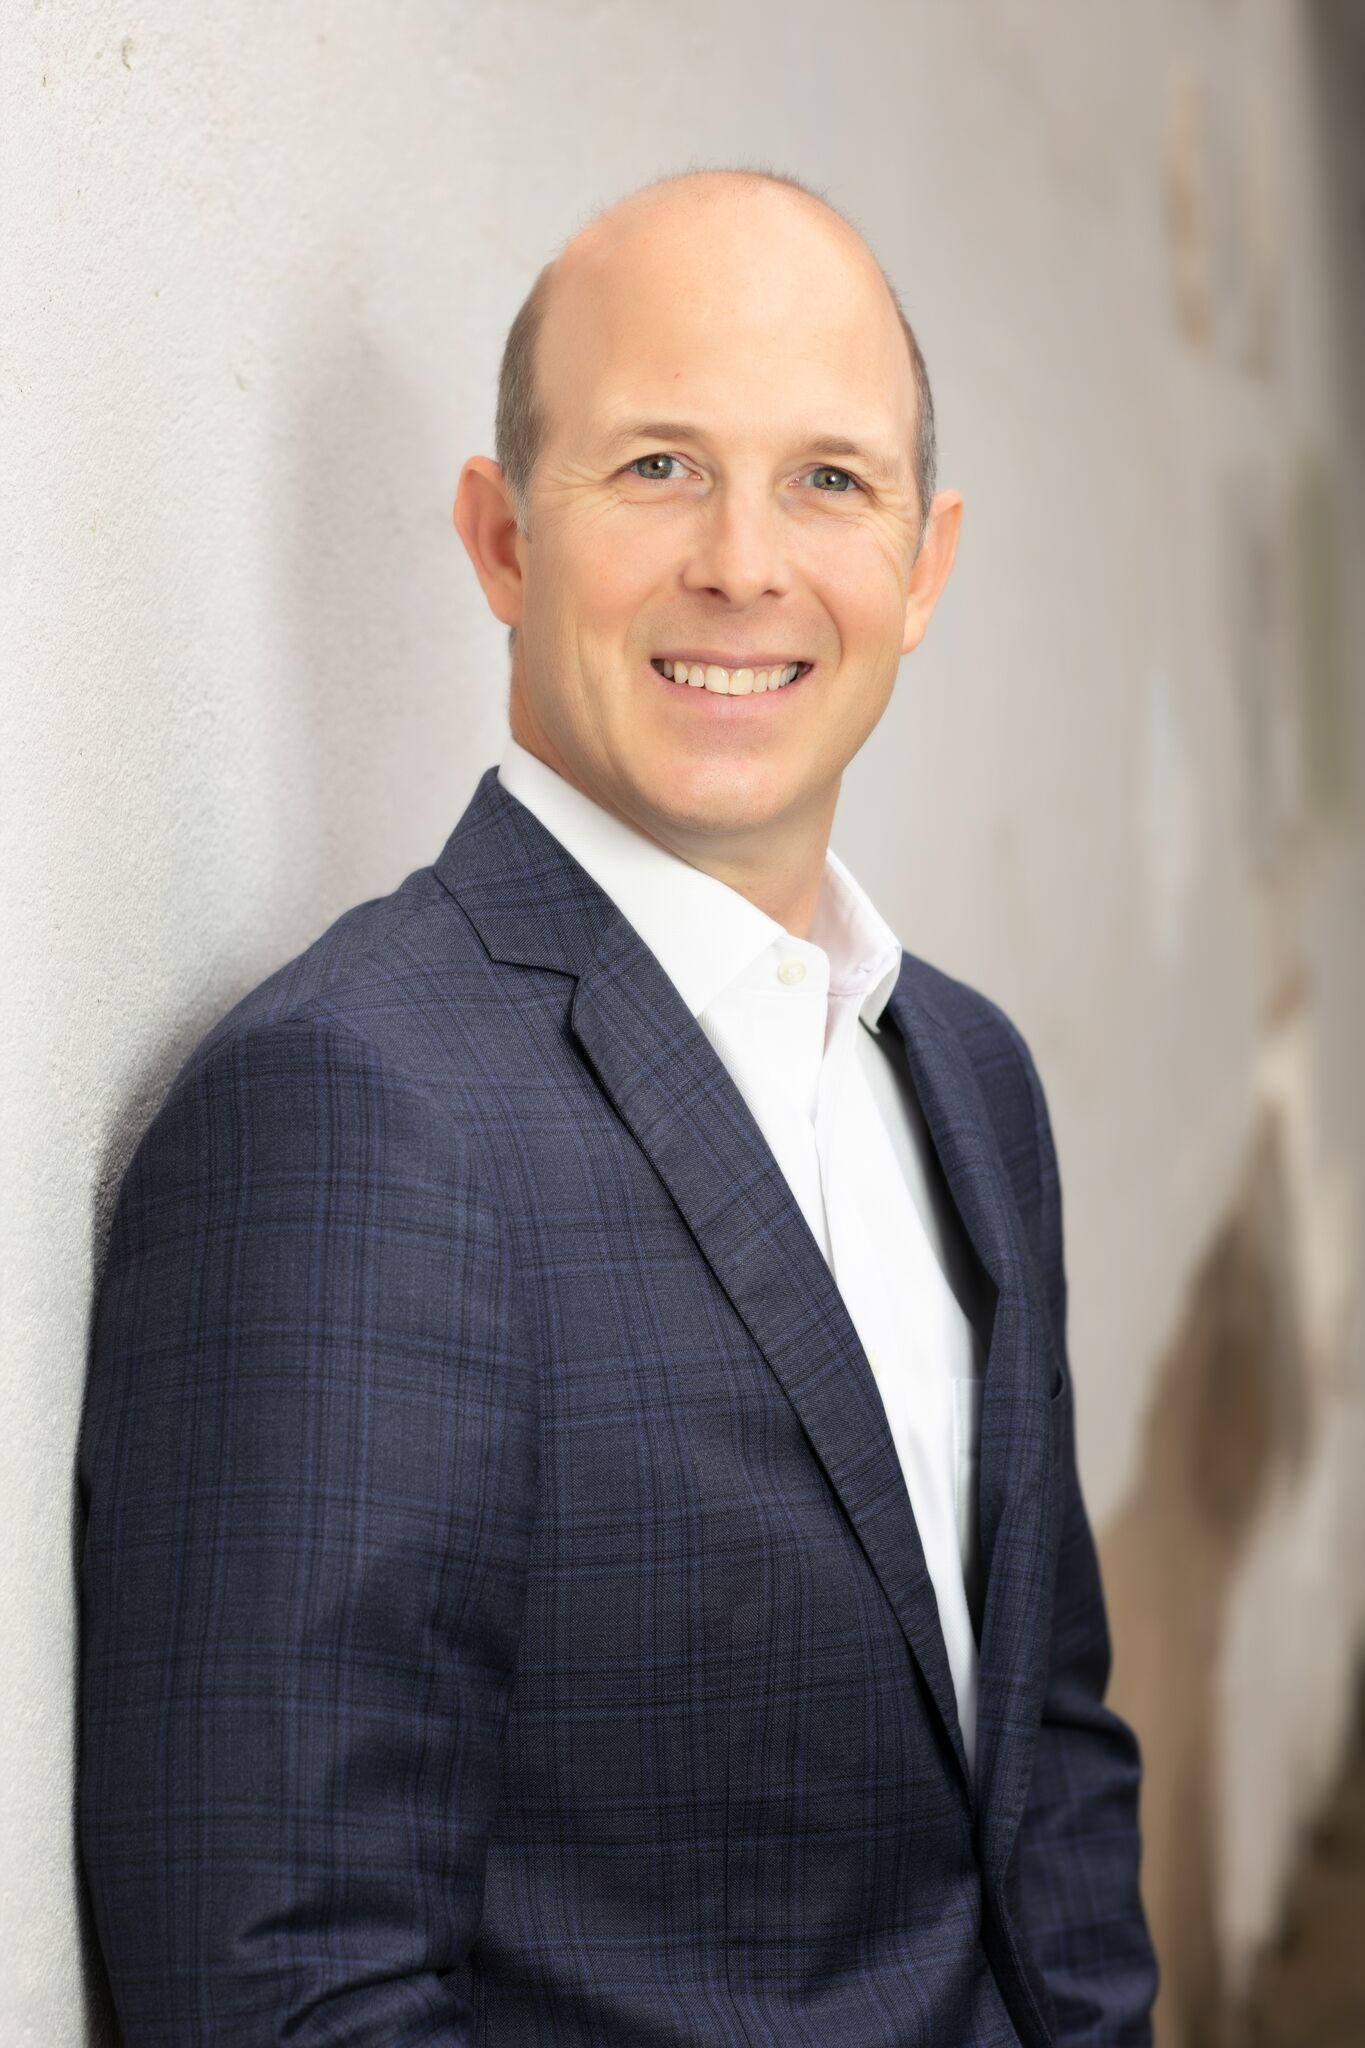 CAMERON MICHAEL REEVES Financial Advisor